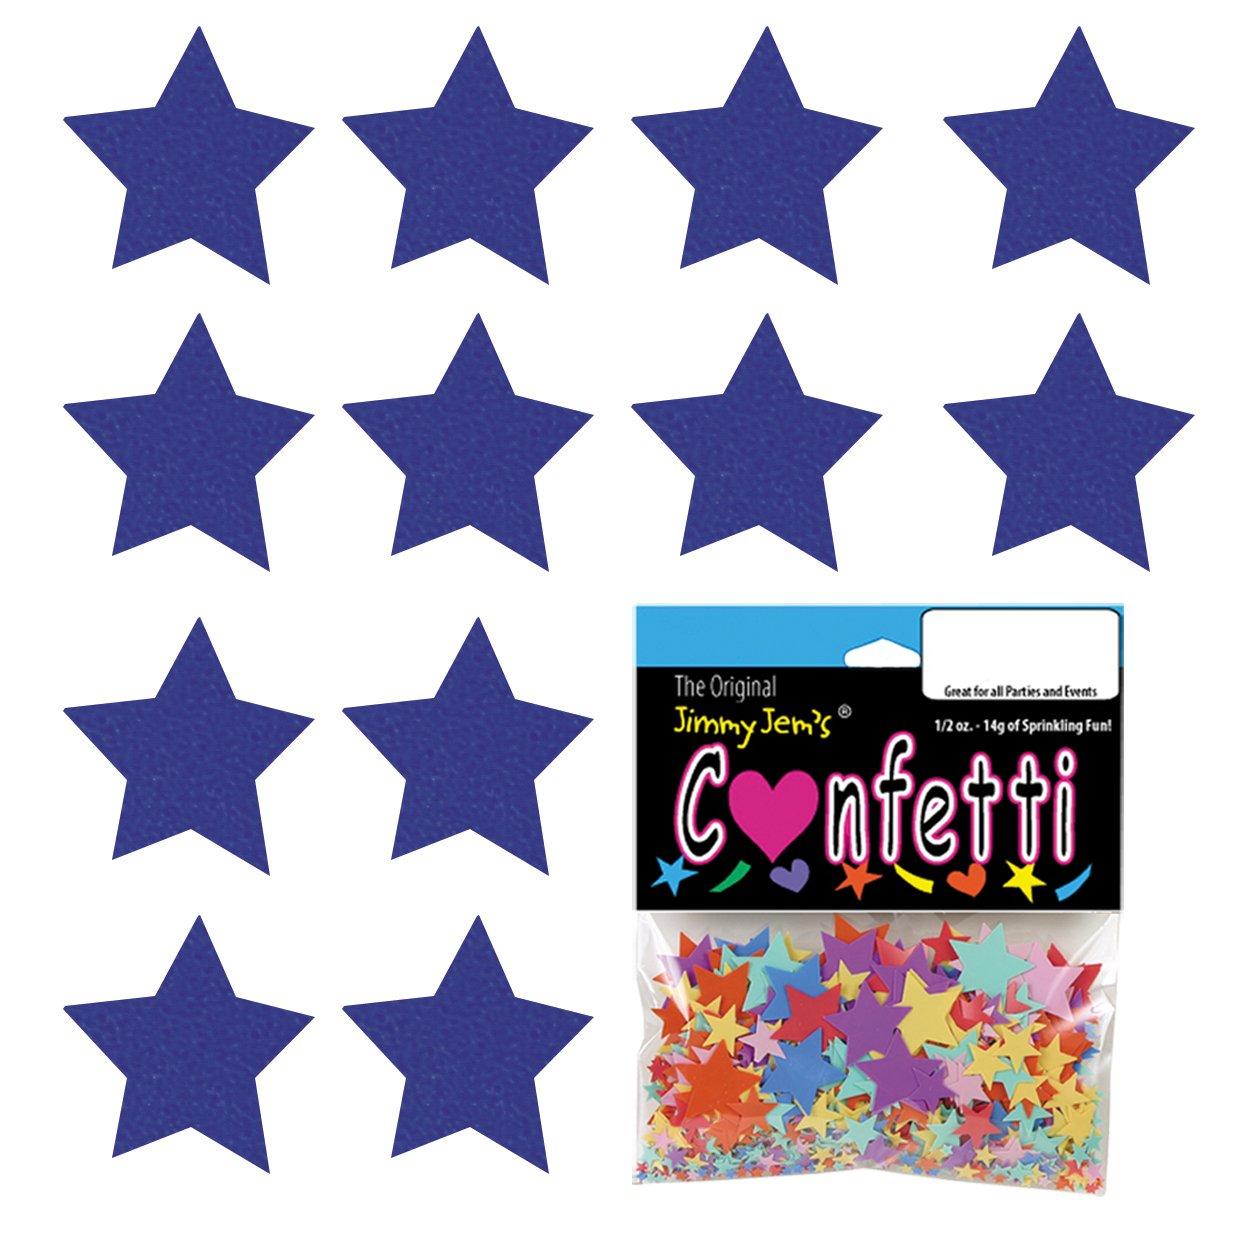 Confetti Star 3/4'' Blue Royal - 8 Half Oz Pouches (4 oz) FREE SHIPPING --- (CCP8623)